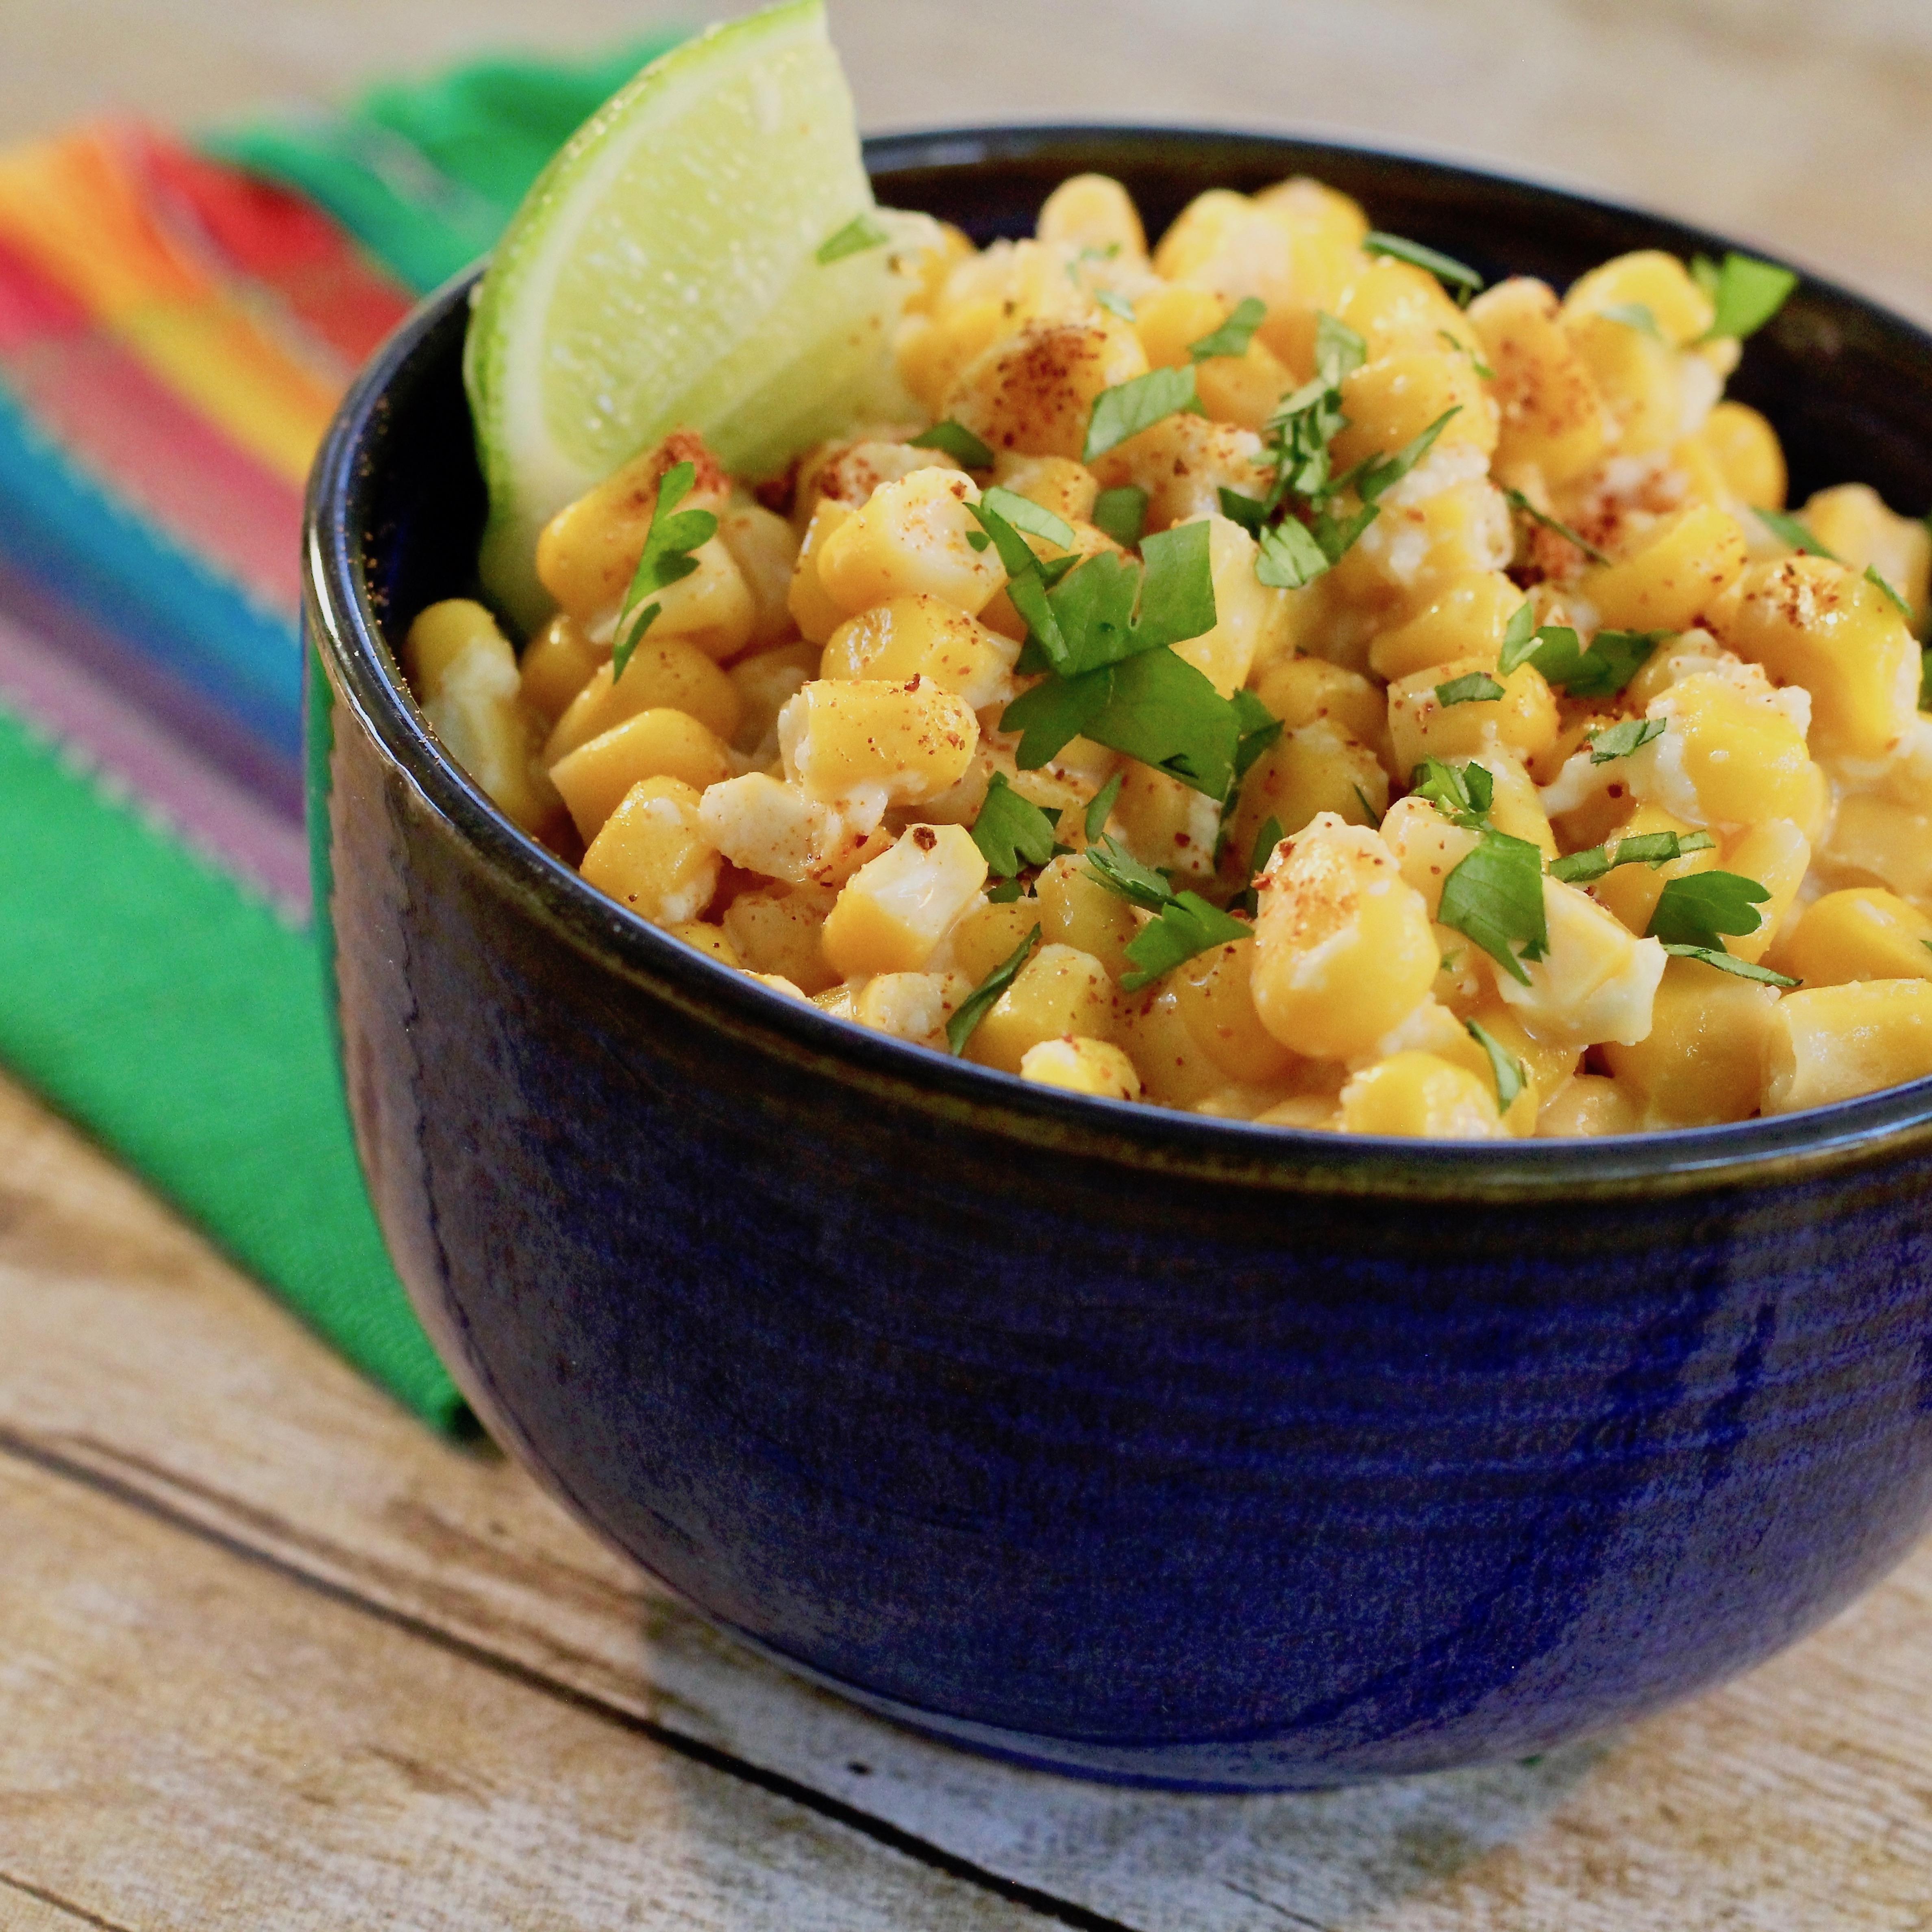 Mexican Street Vendor Style Corn Salad lutzflcat